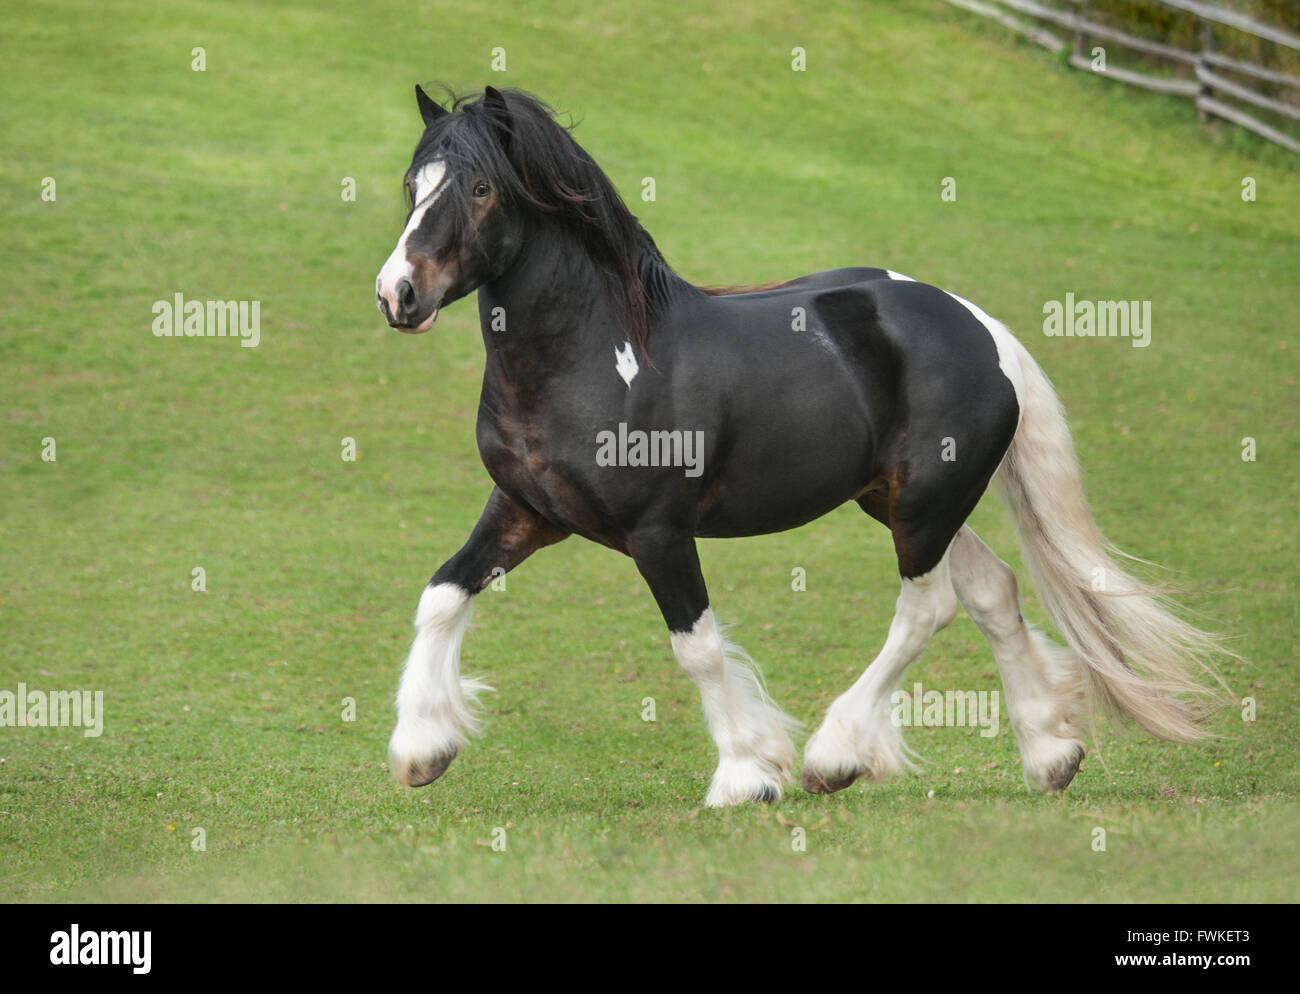 Gypsy Vanner Horse stallion. - Stock Image